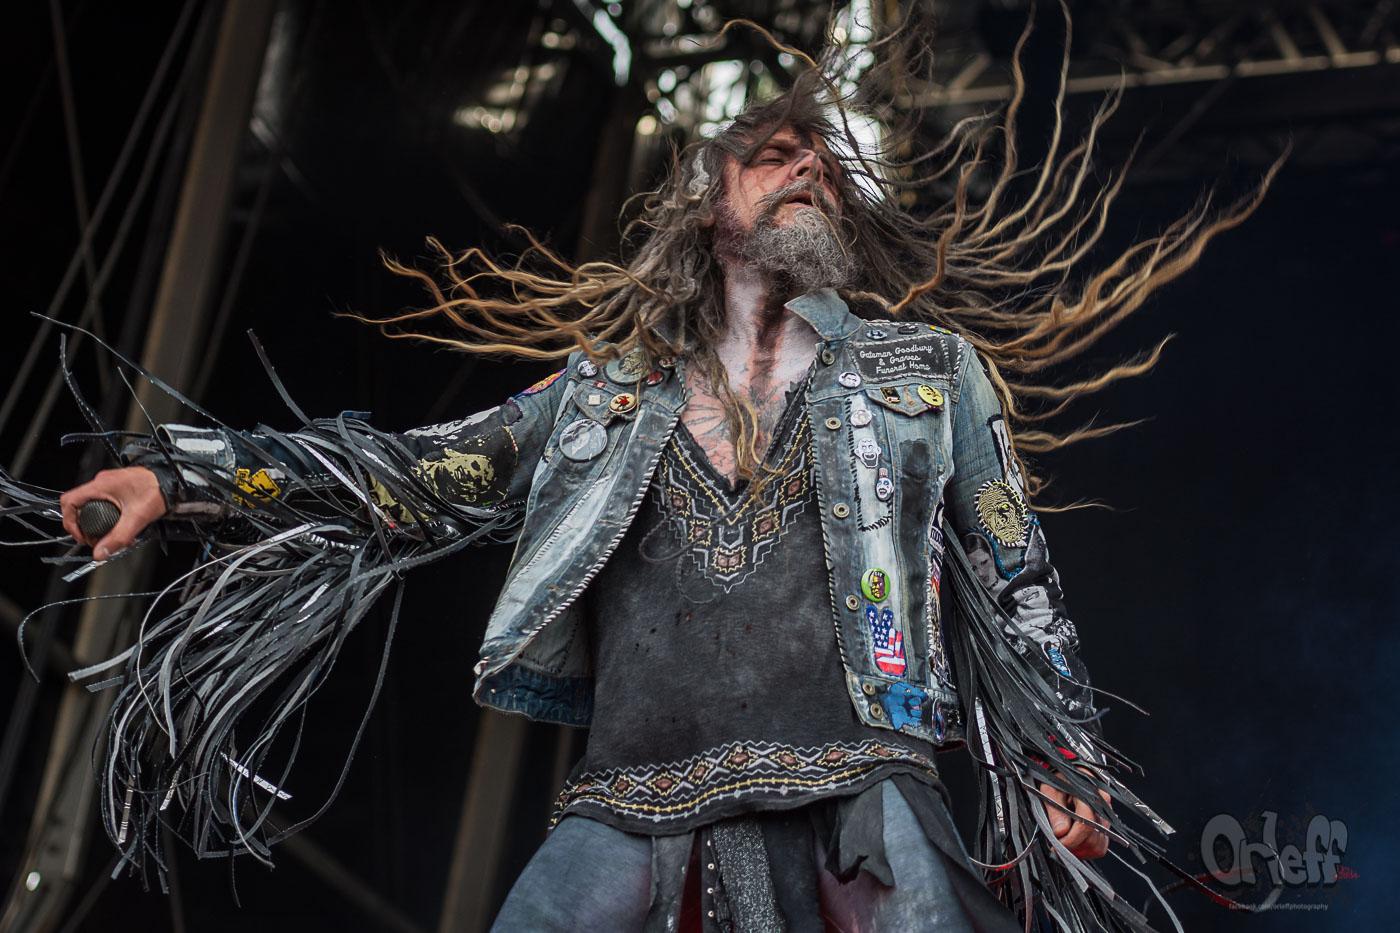 Rob Zombie @ Nova Rock 2019